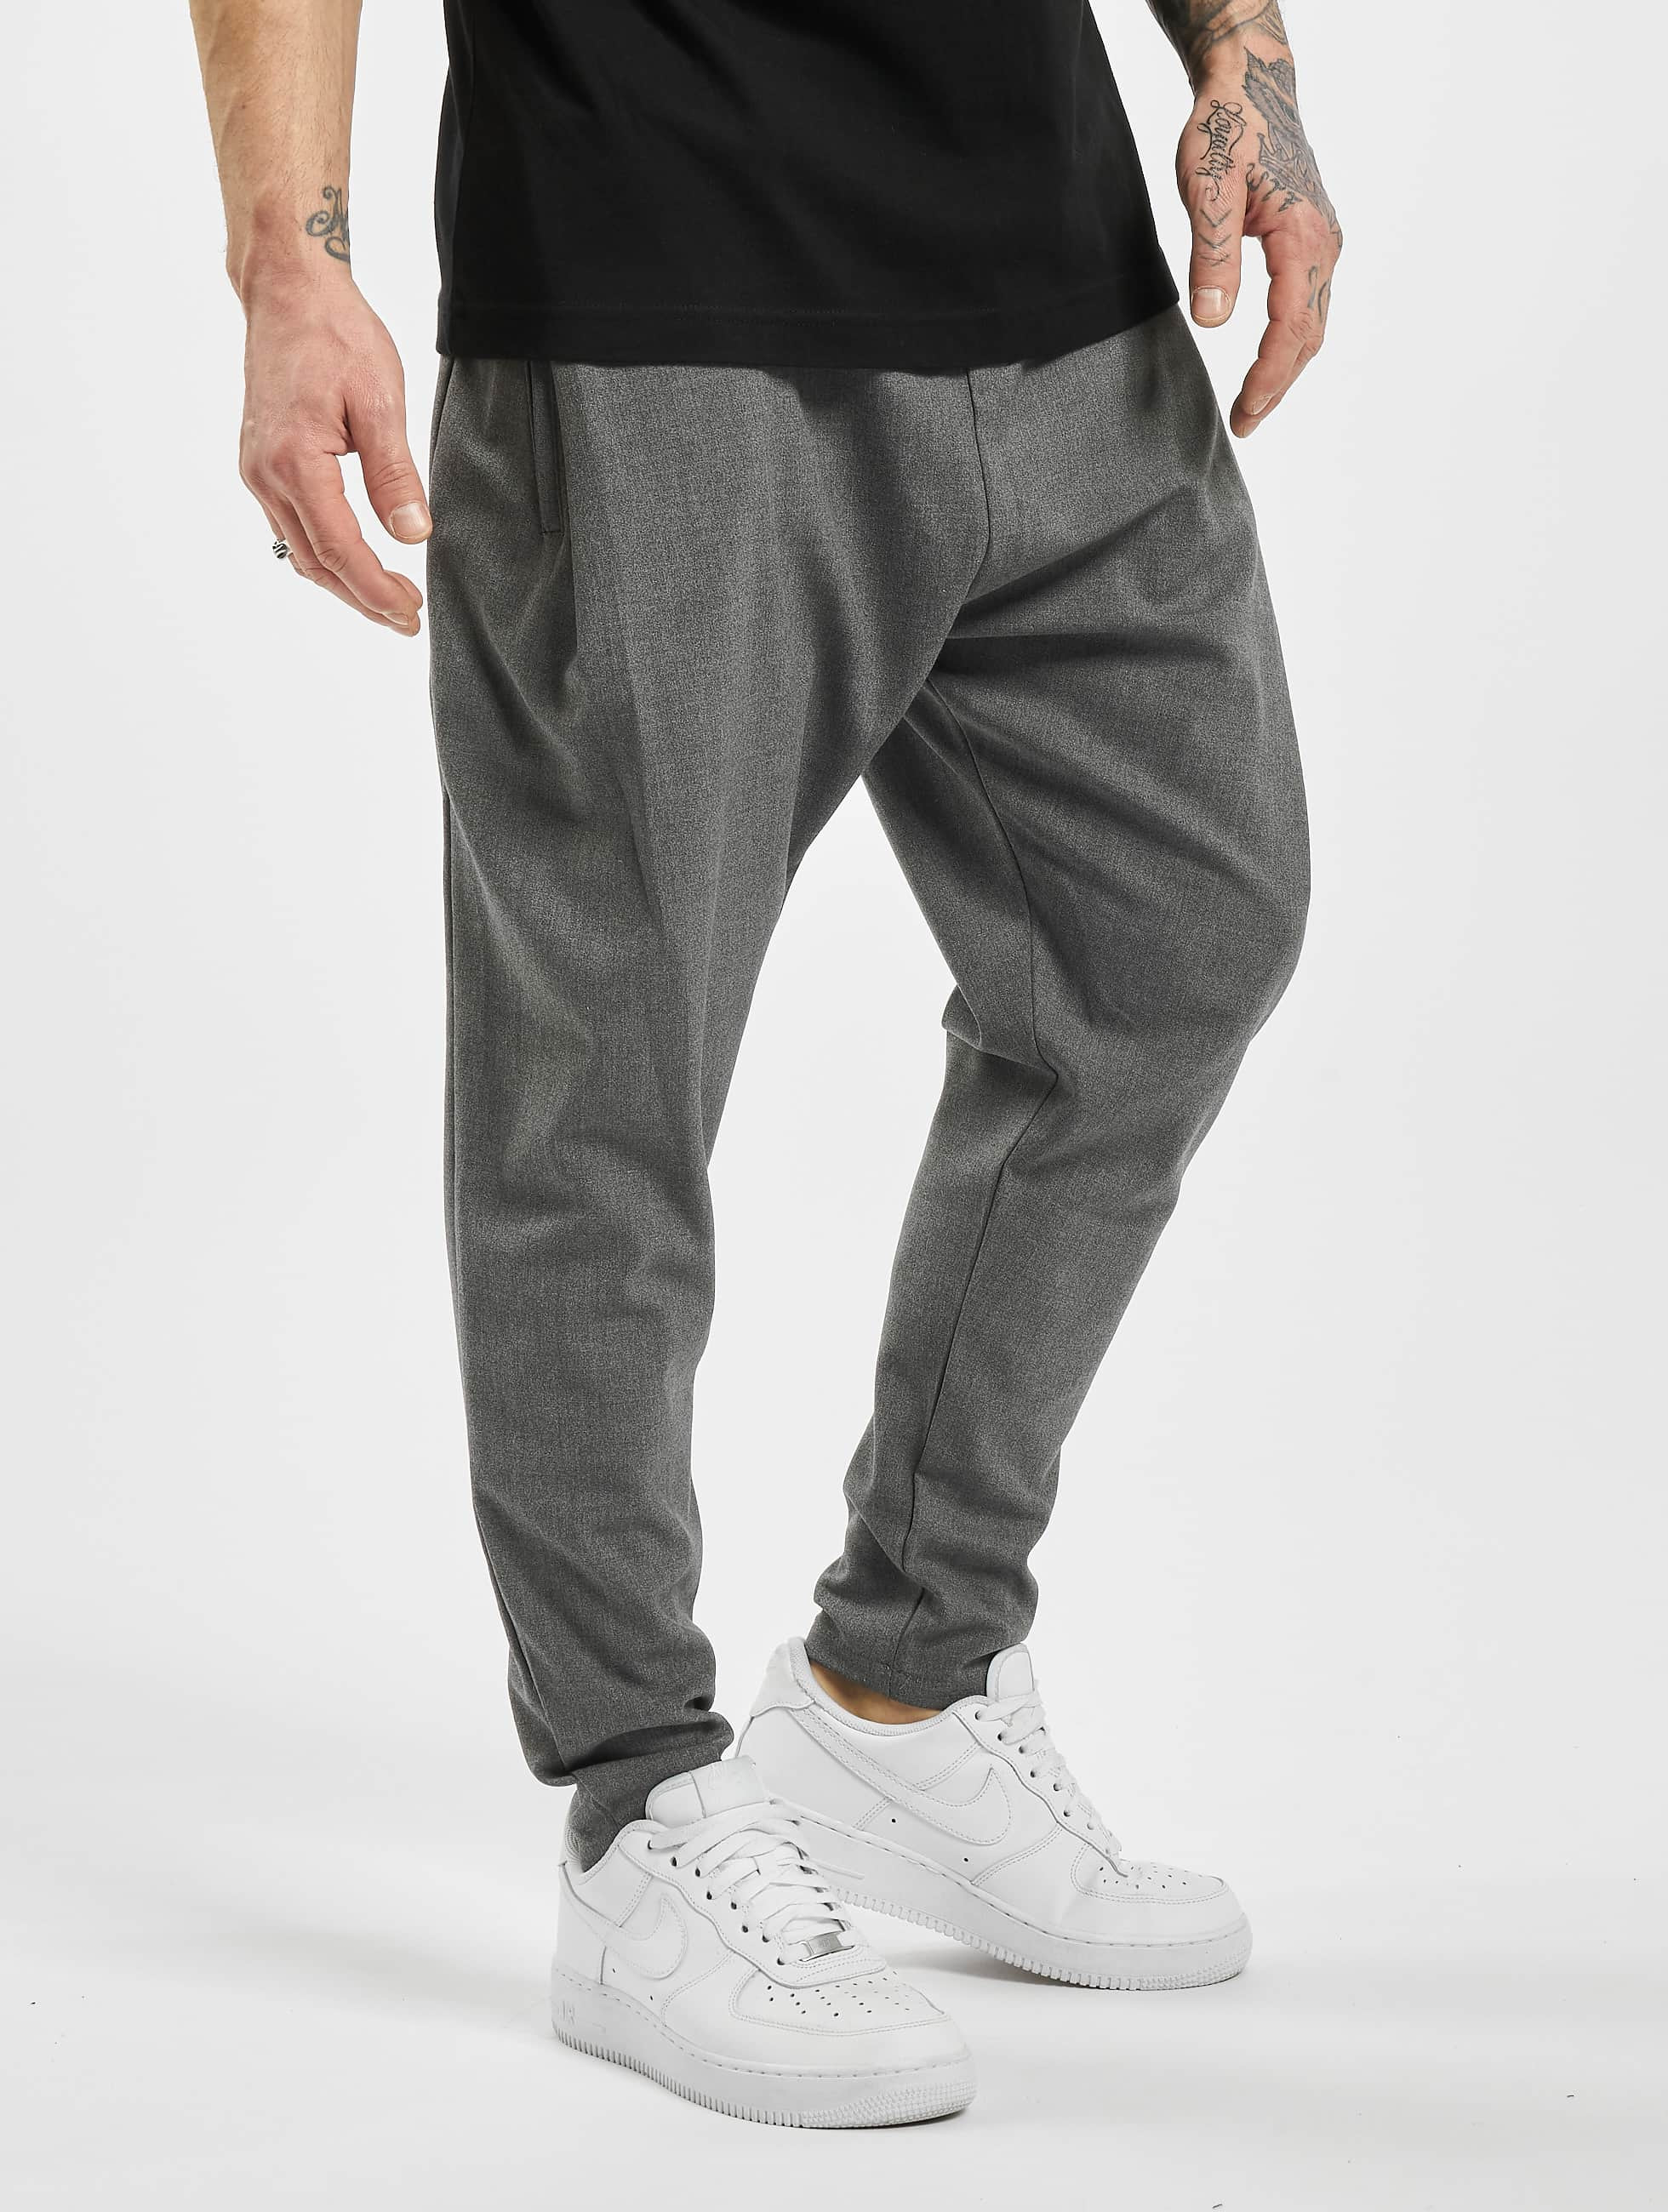 2Y / Chino Luan in grey XL